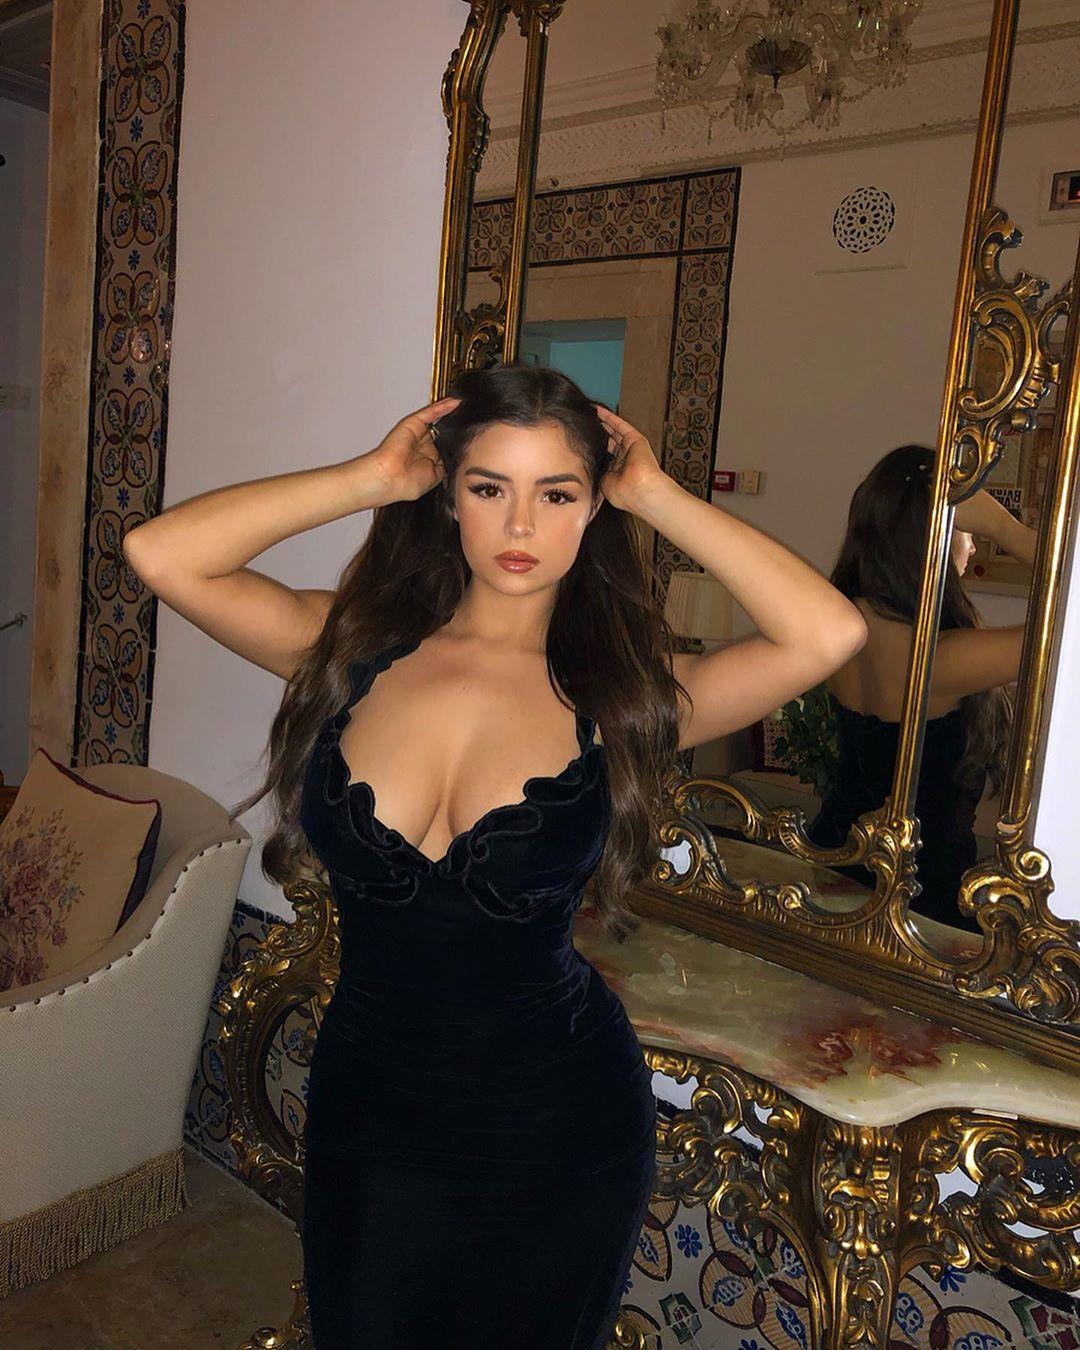 Porno Pictures Evening Dress